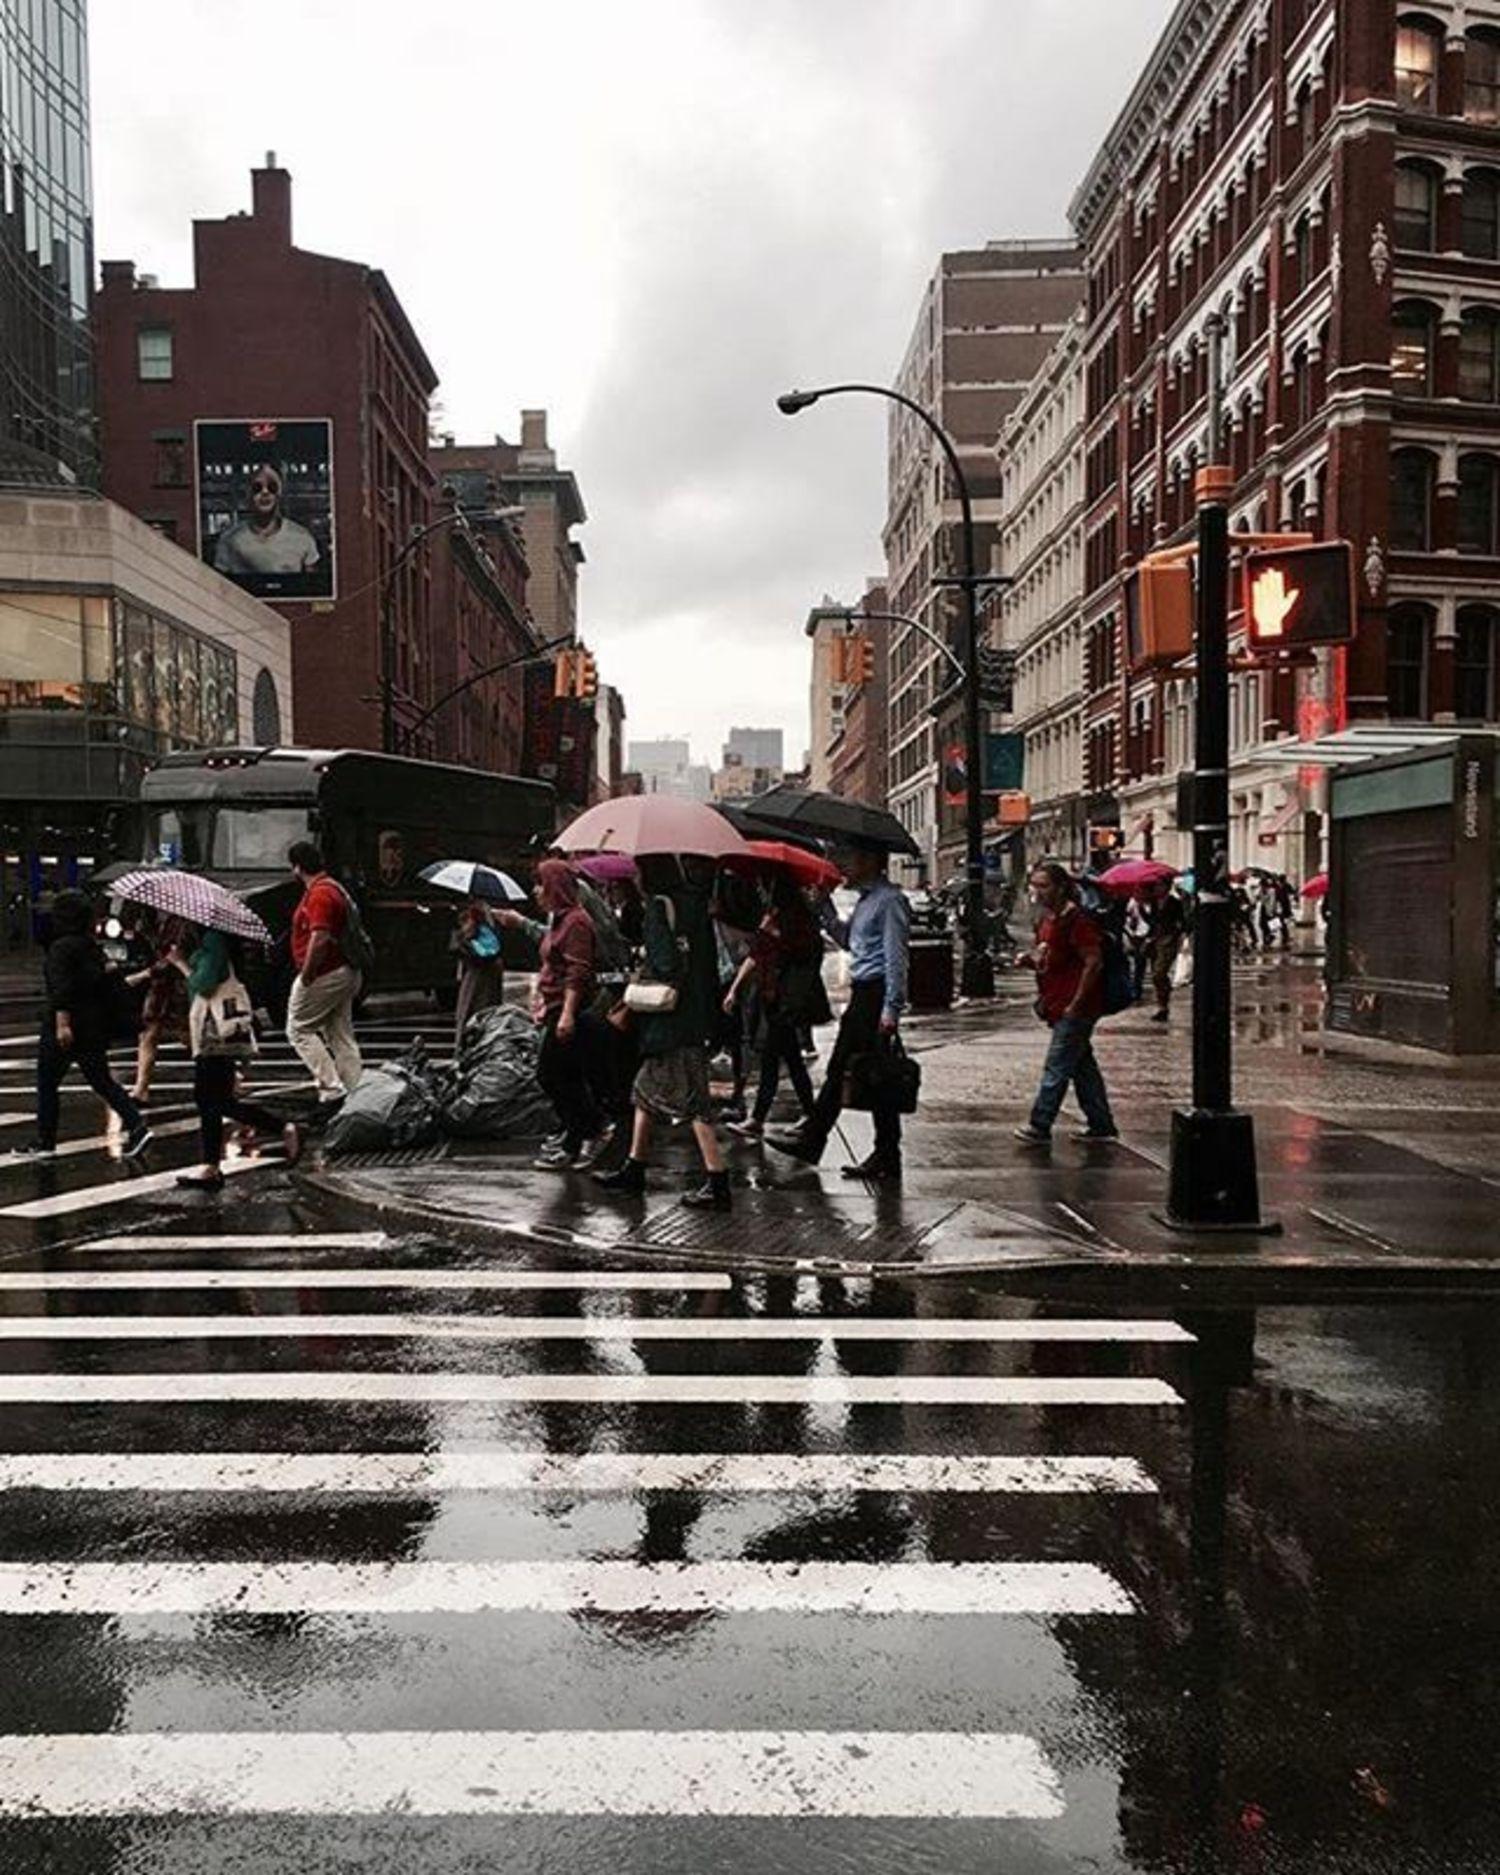 New York, New York. Photo via @groveandbleecker #viewingnyc #newyorkcity #newyork #nyc